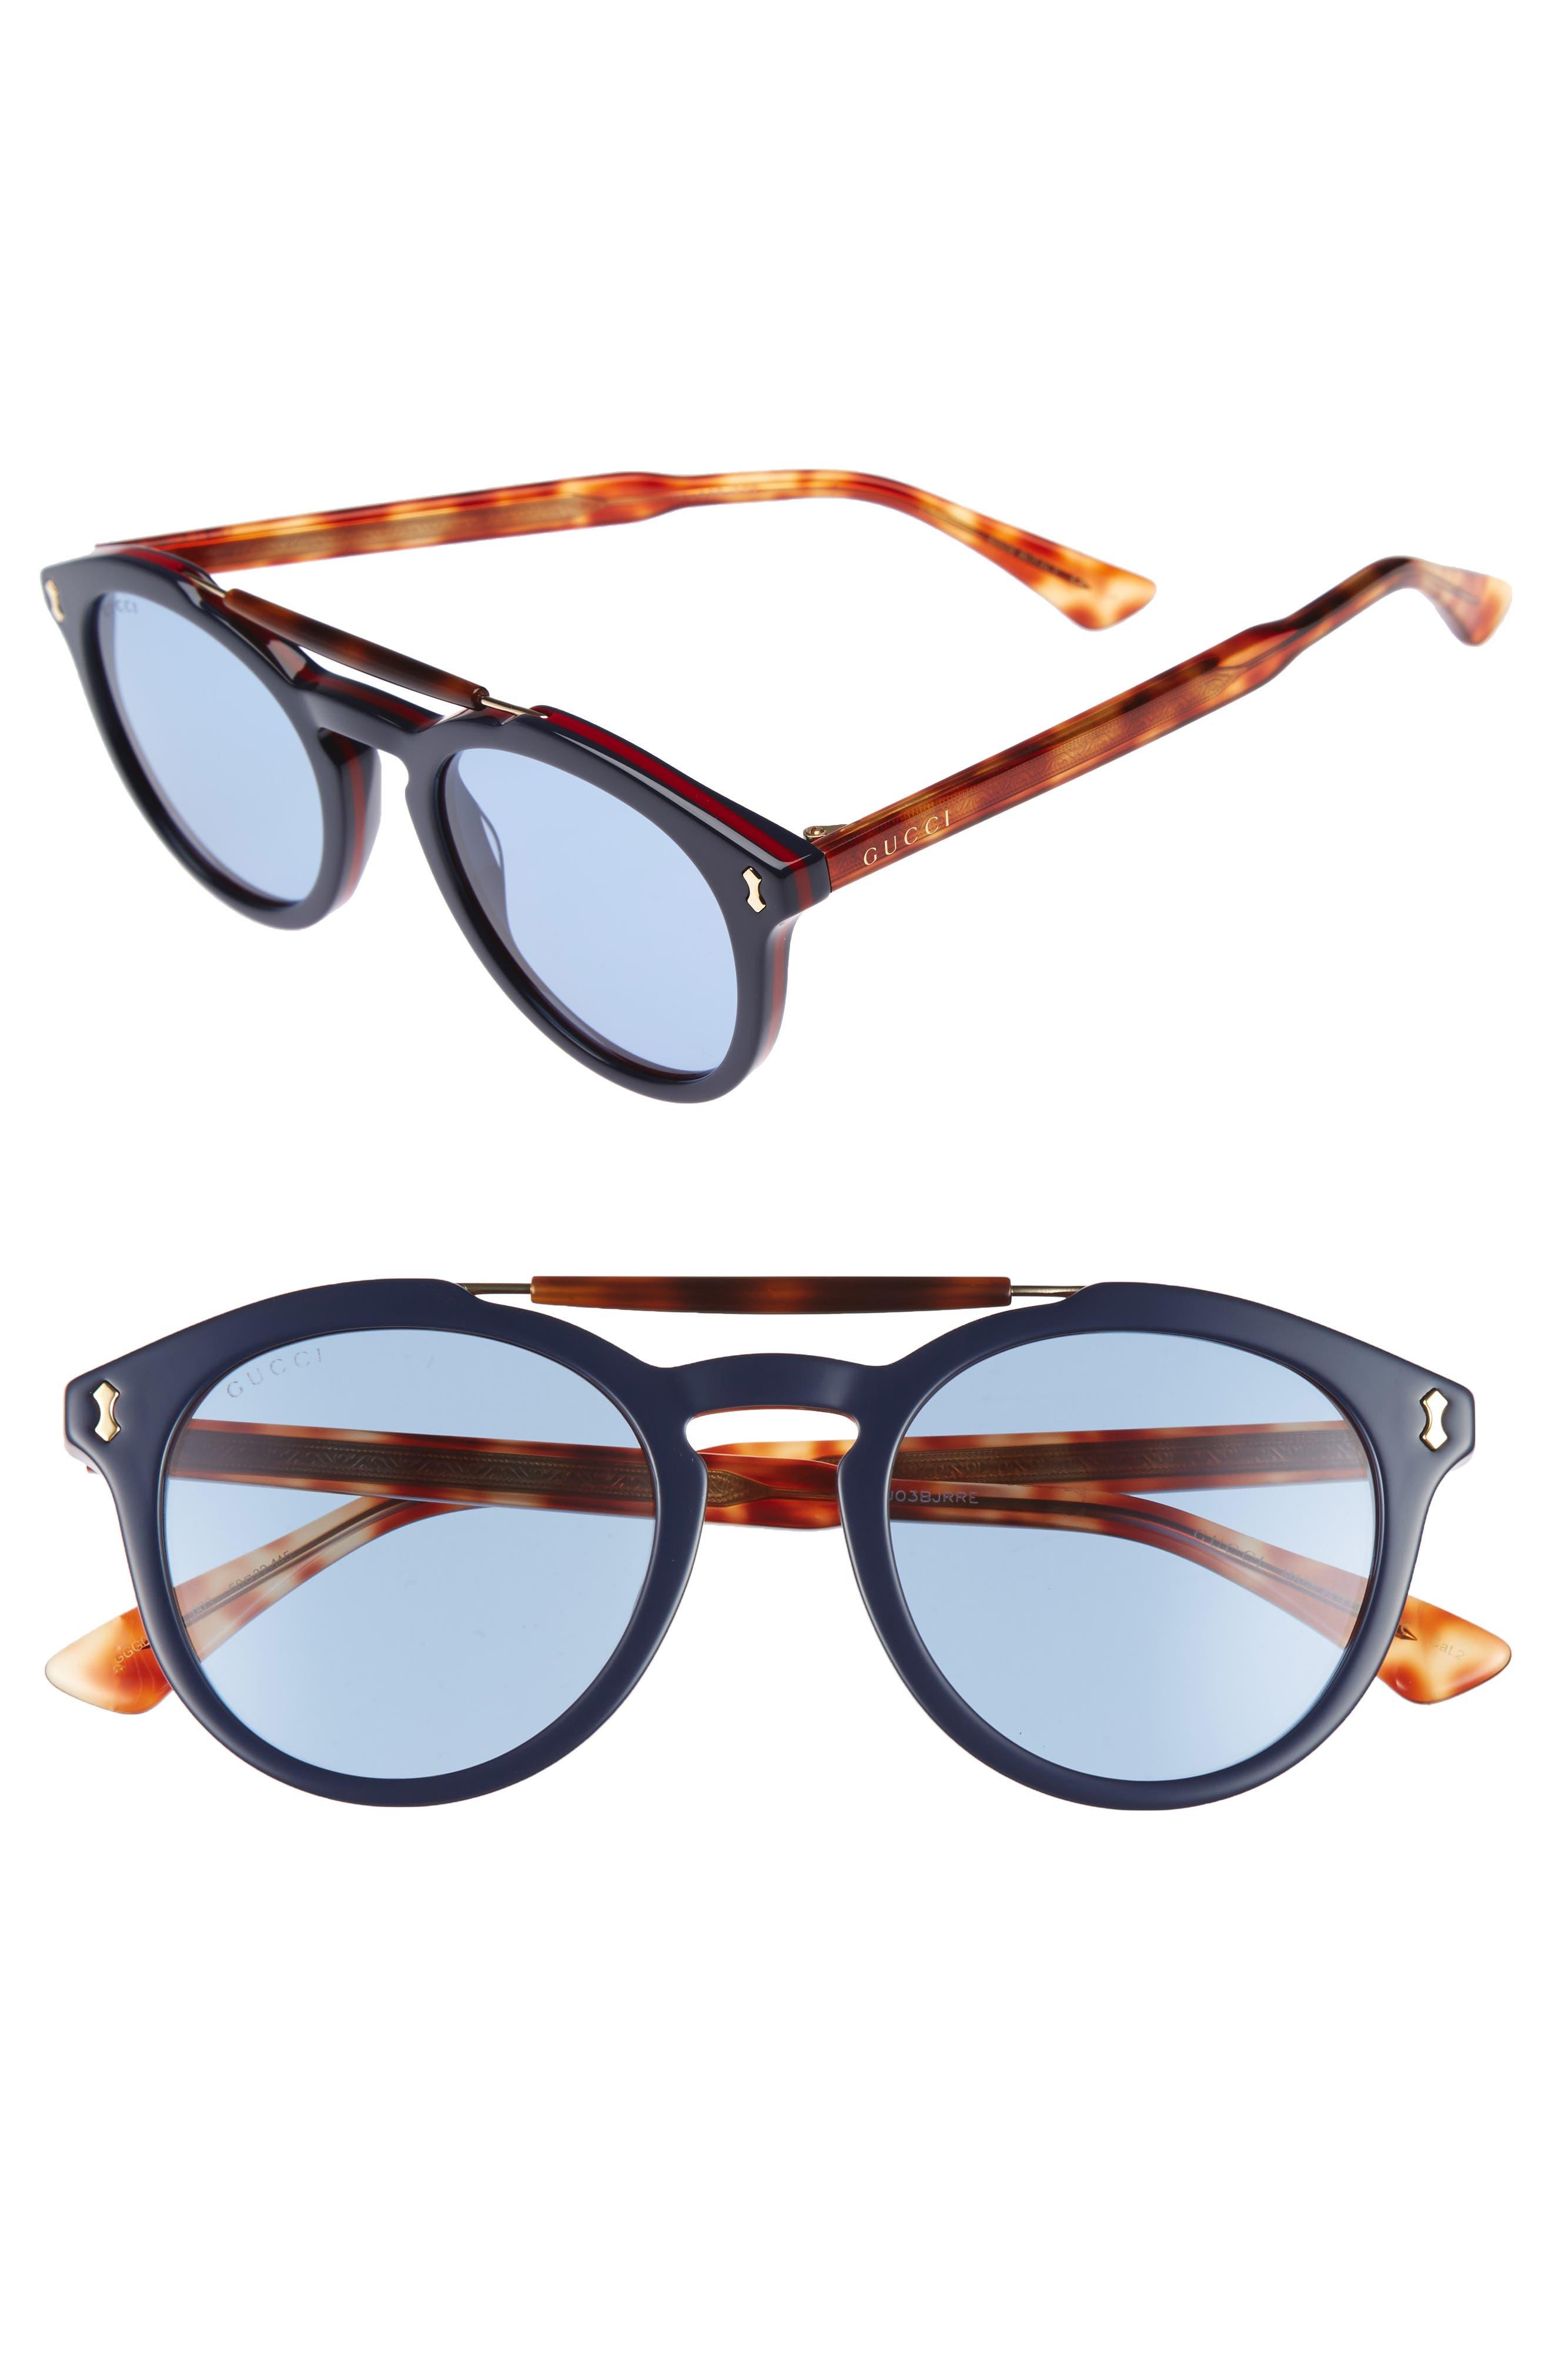 Alternate Image 1 Selected - Gucci Vintage Pilot 50mm Sunglasses